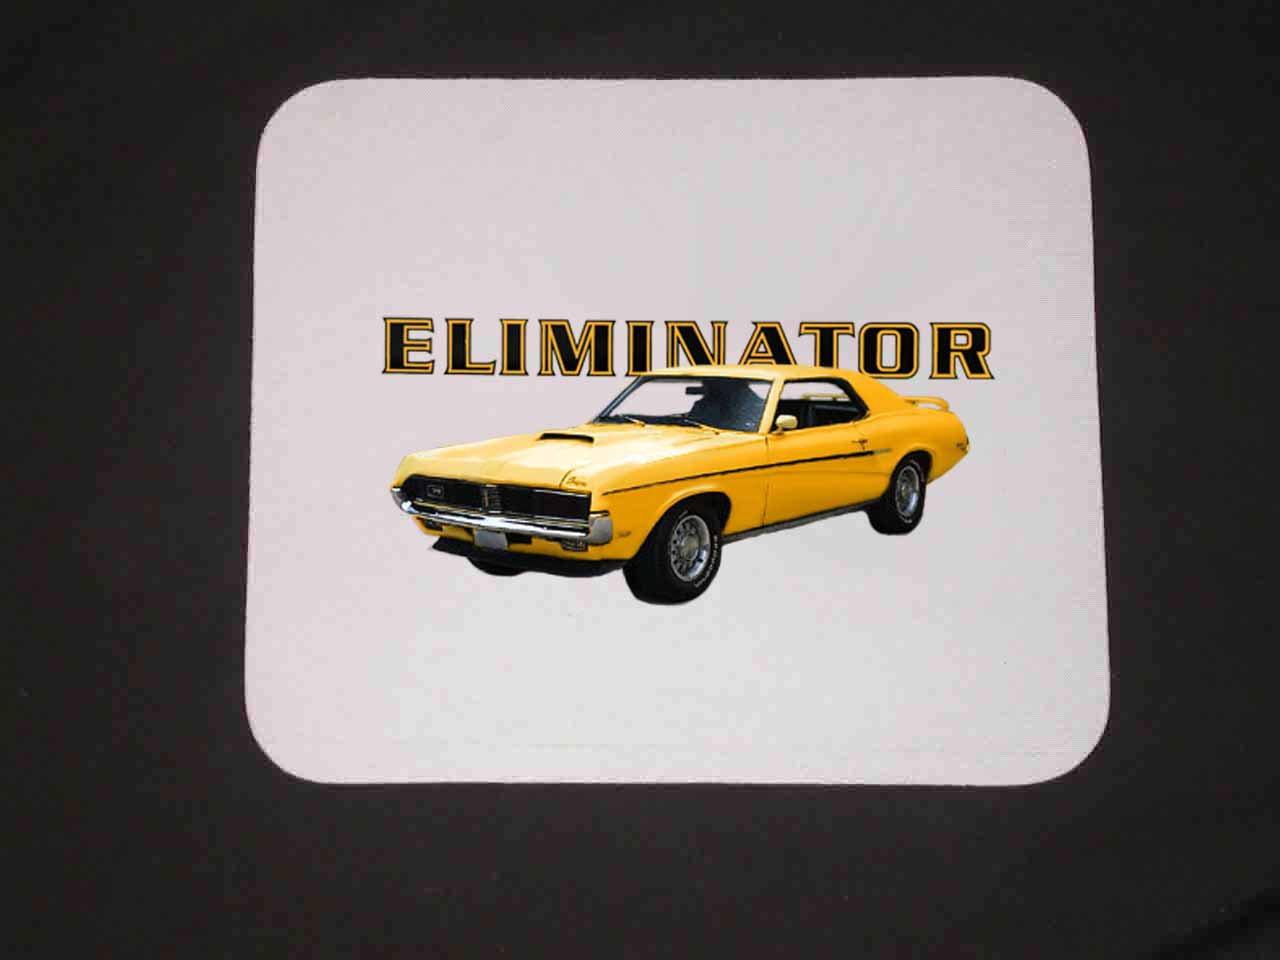 New 1969 Mercury Cougar Eliminator Mousepad!